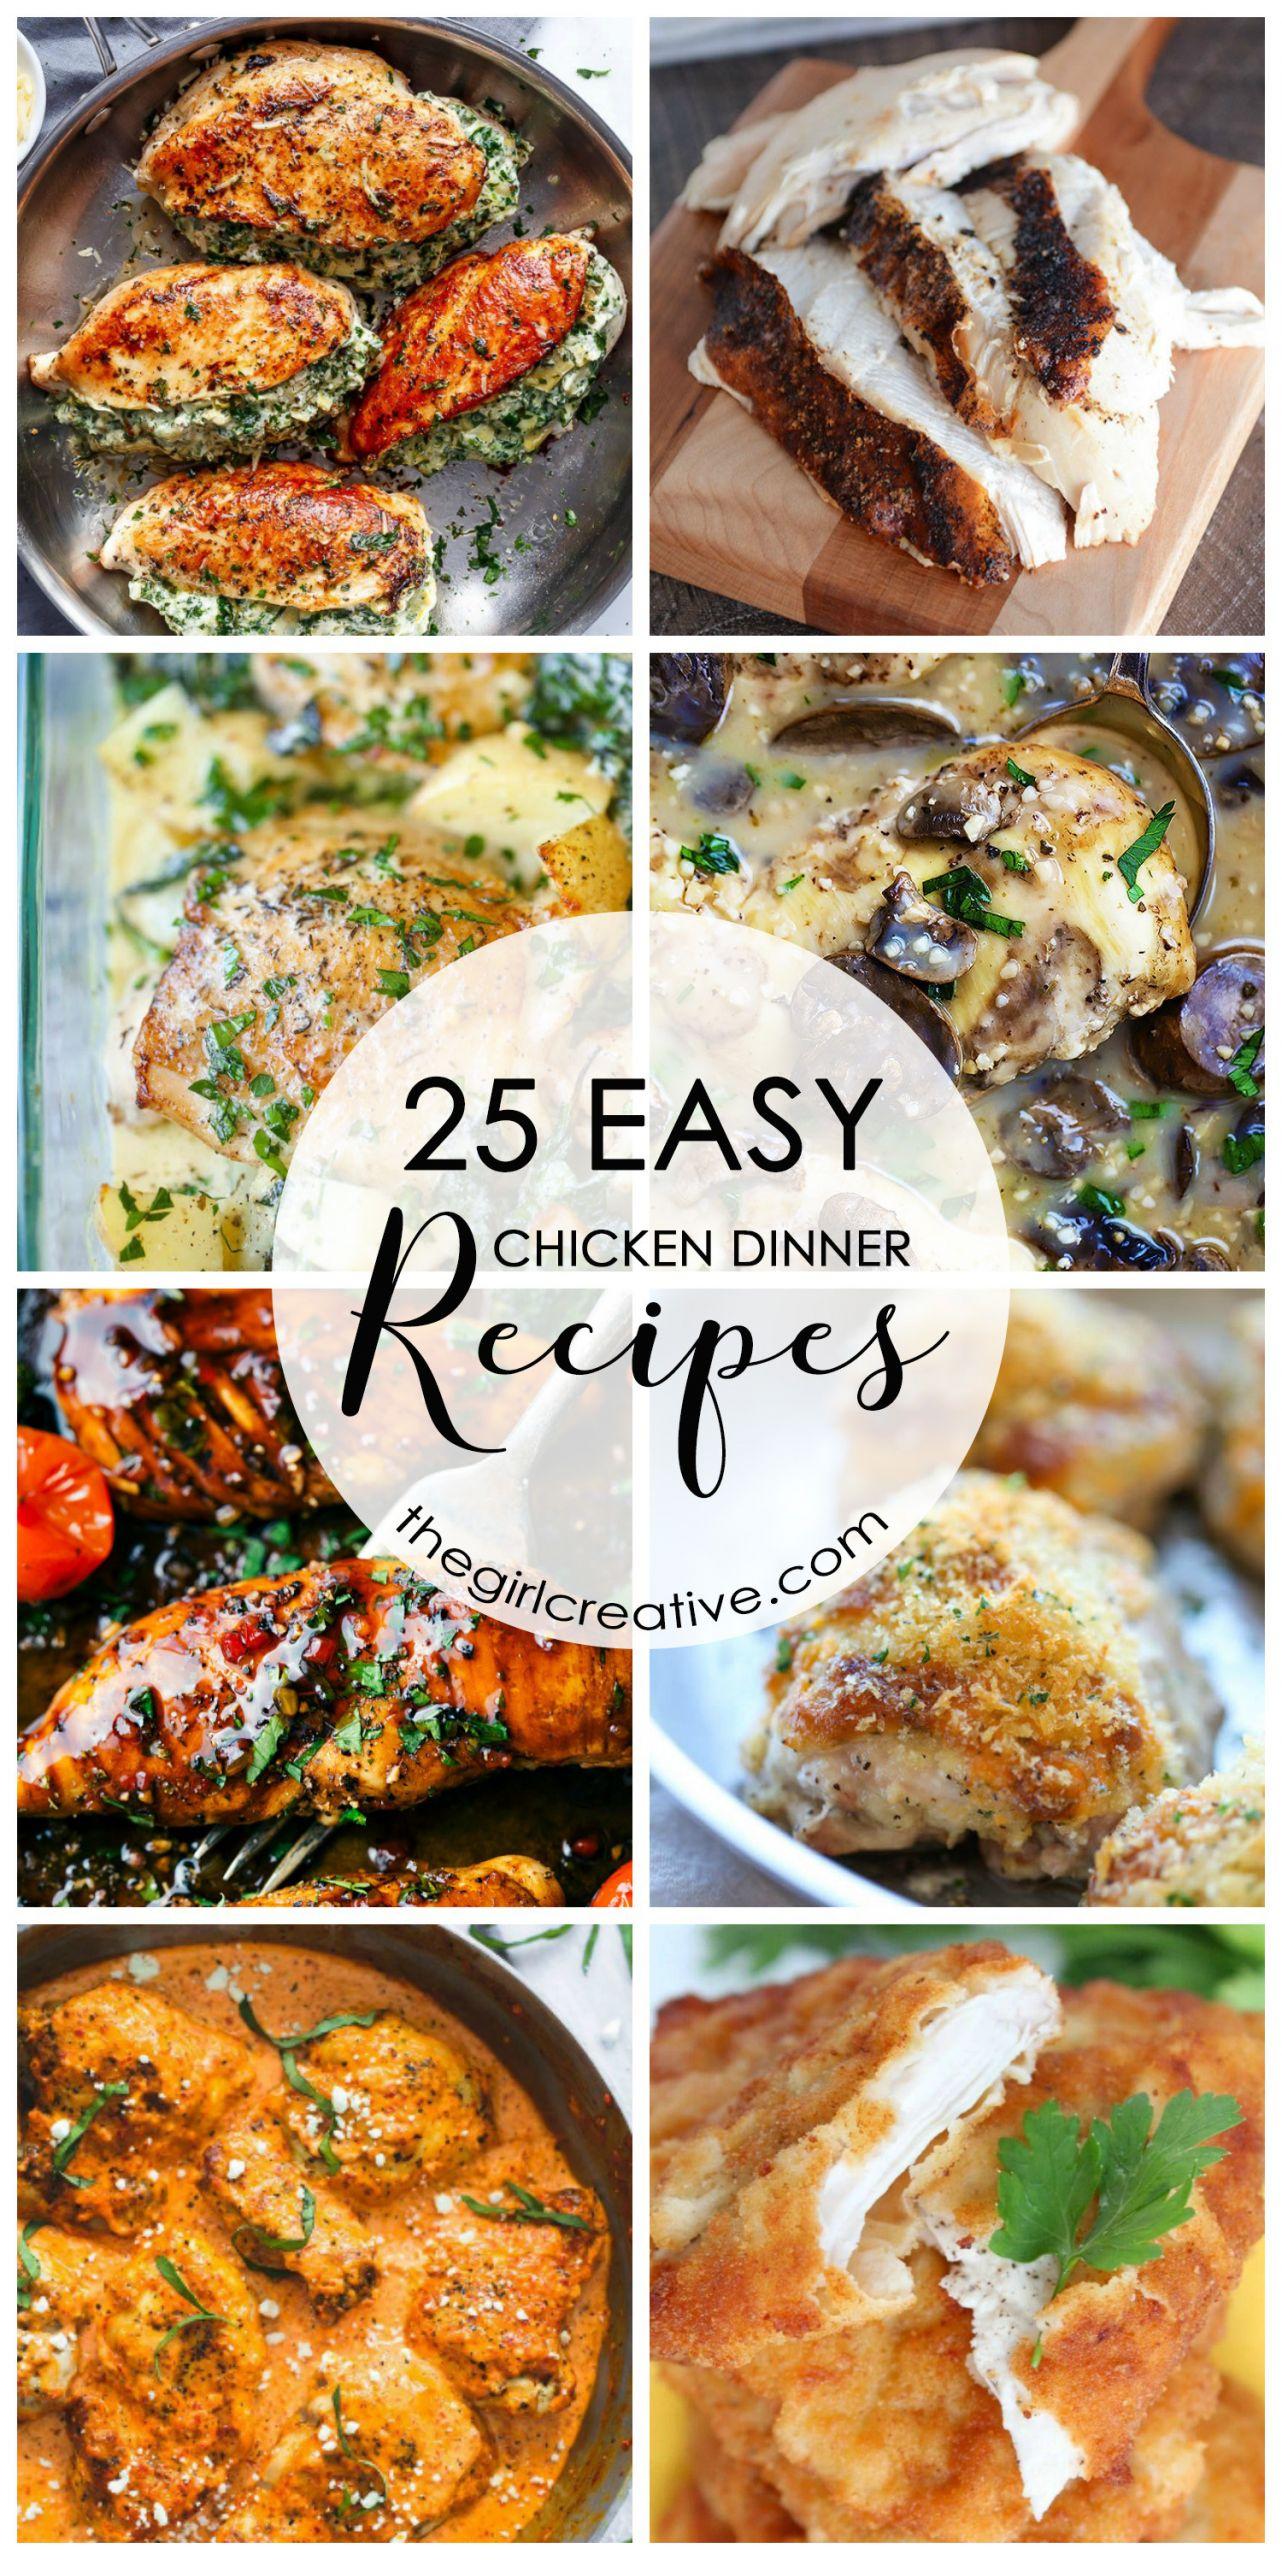 Easy Chicken Dinners  25 Easy Chicken Dinner Recipes The Girl Creative